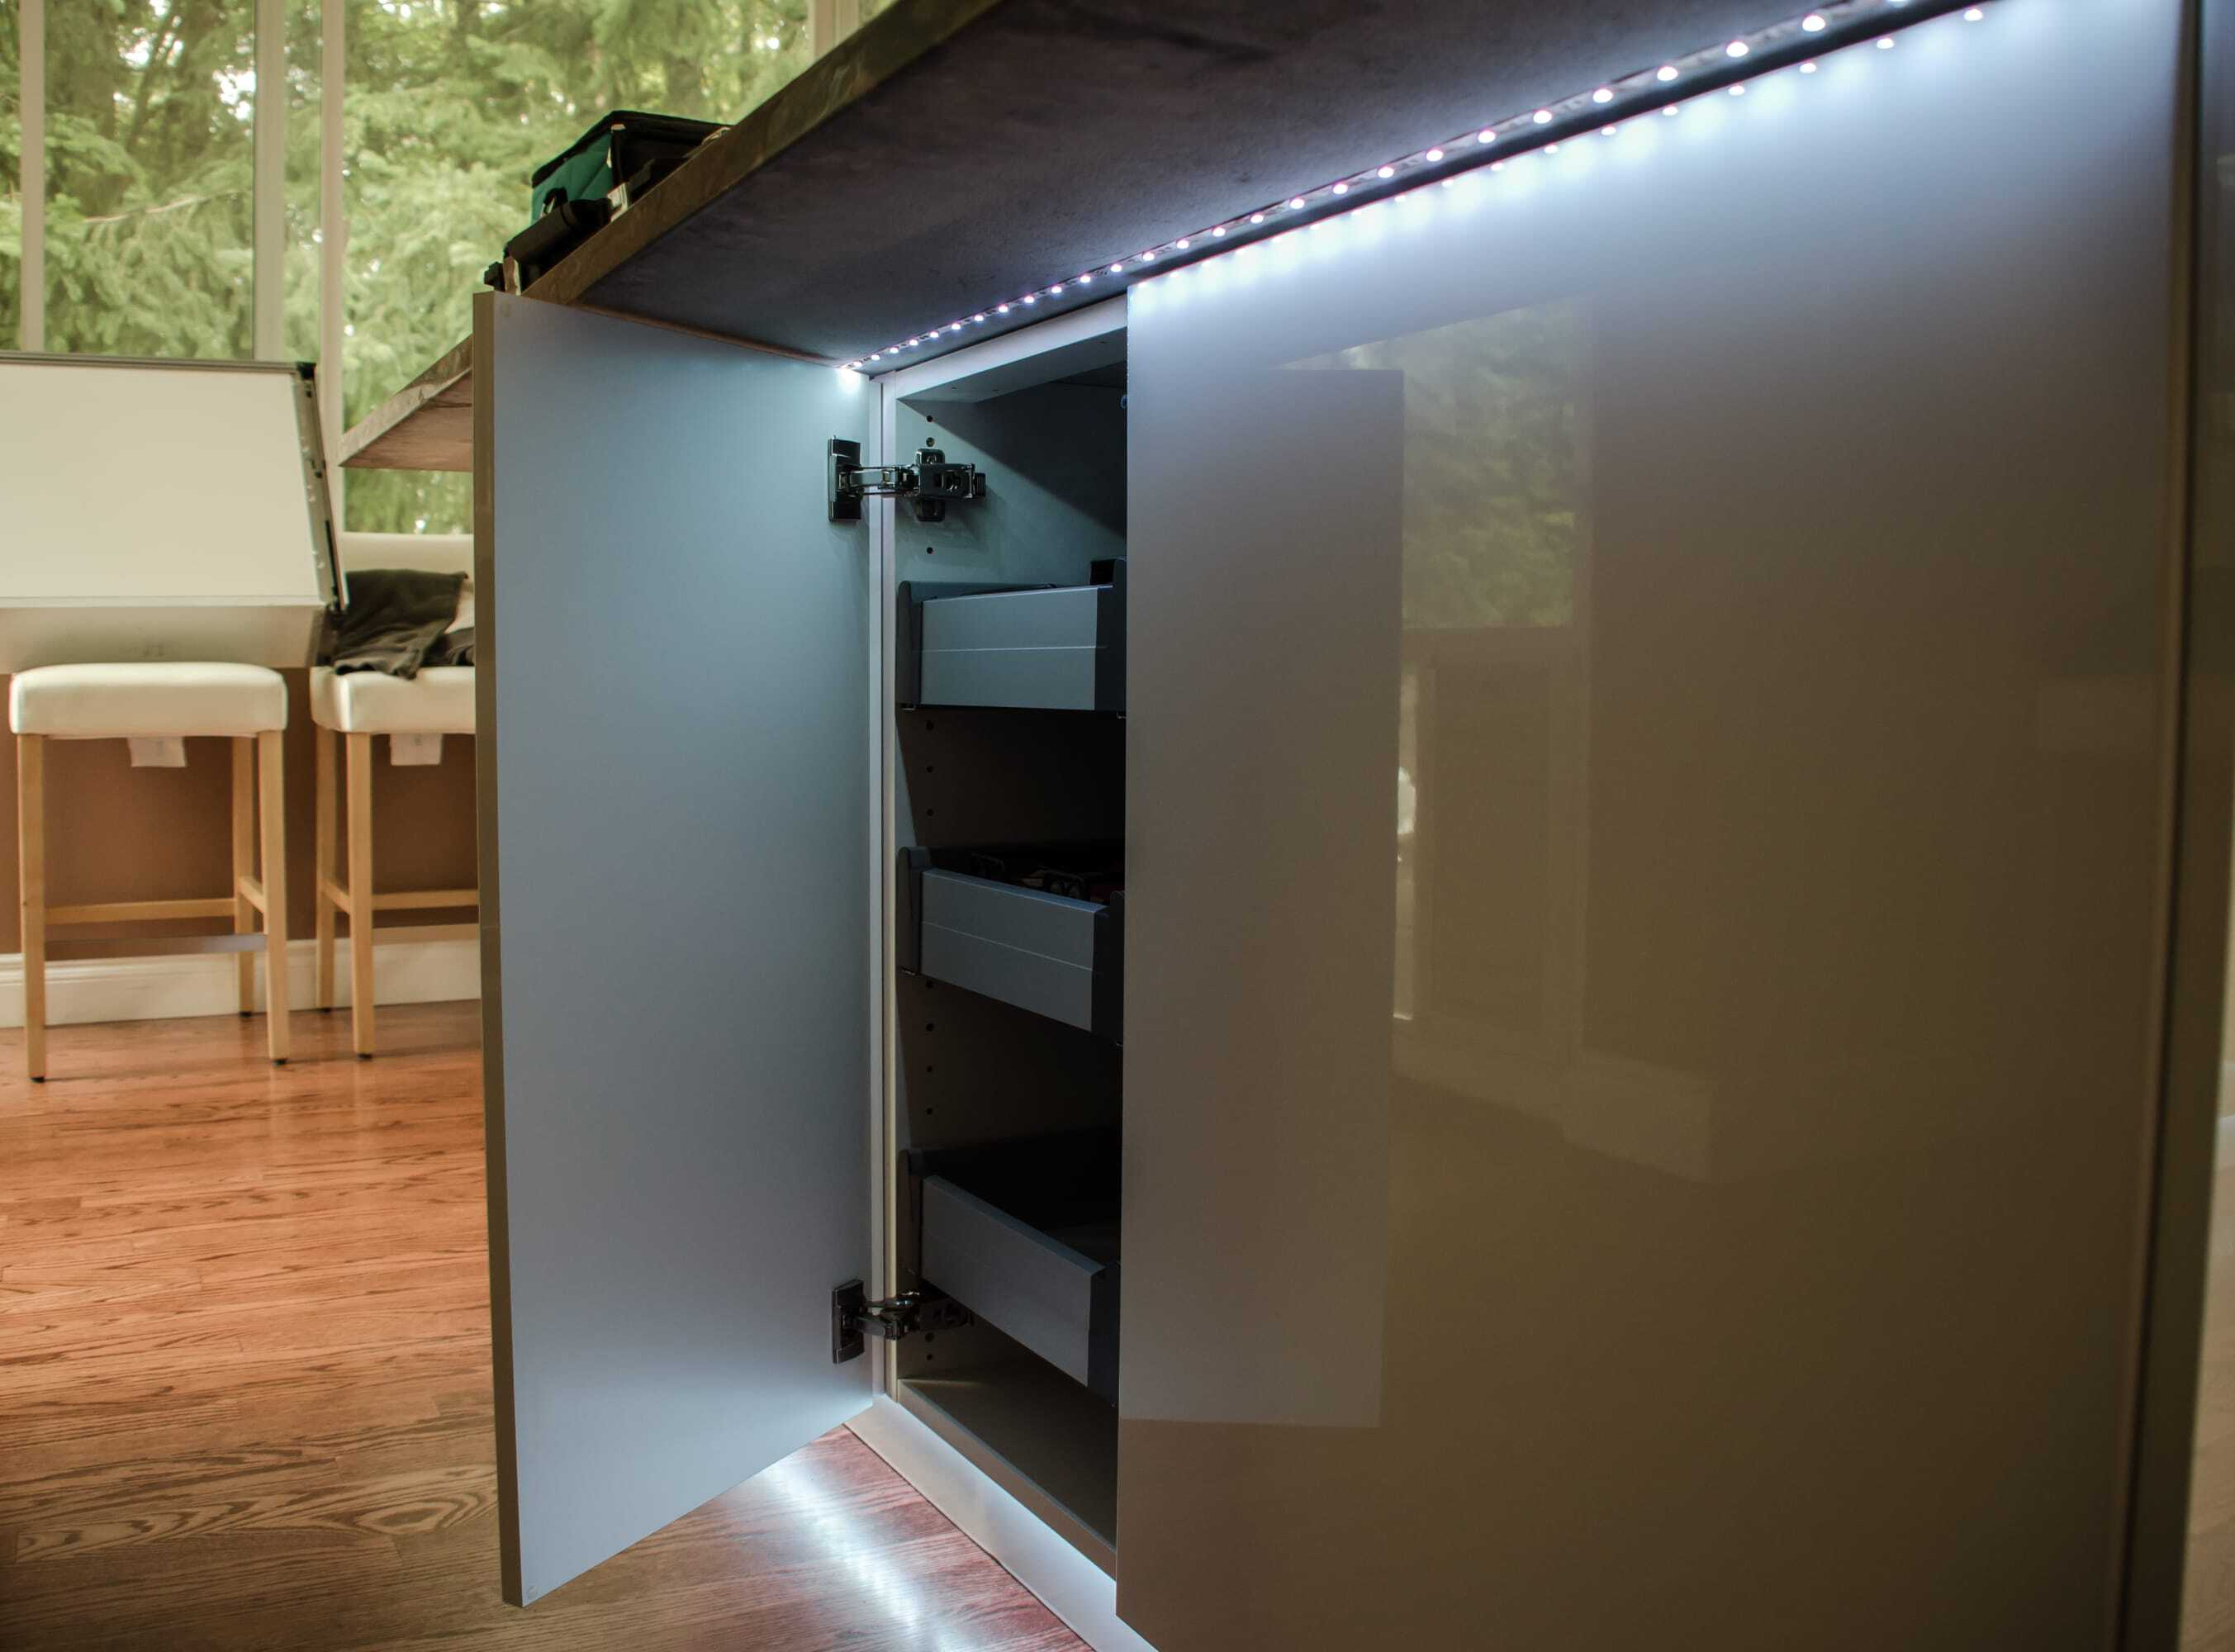 LED.Kitchen.lighting.under.counter